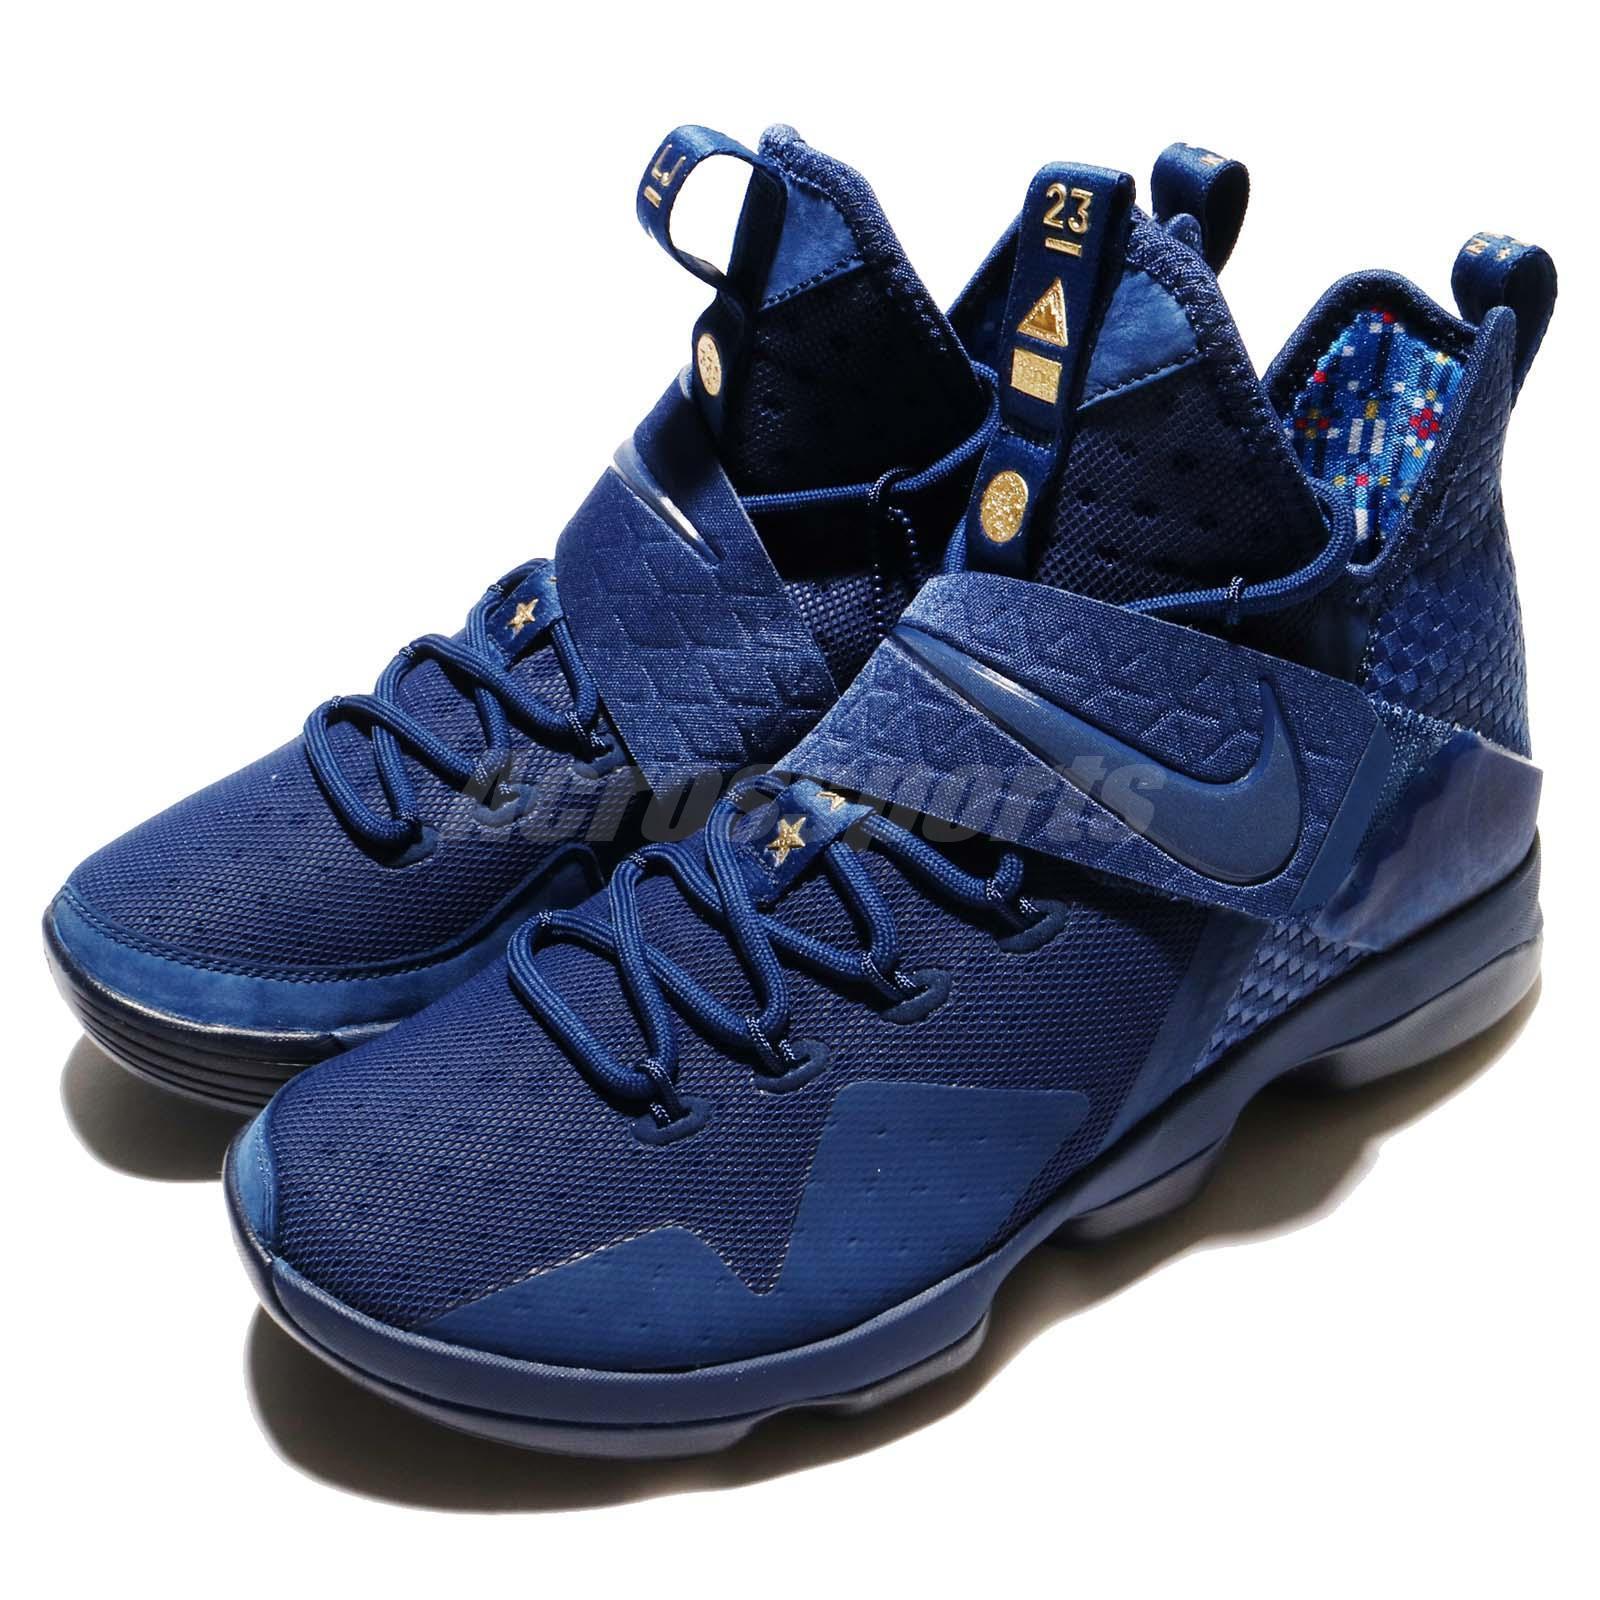 63b3c0c9d3e Nike Lebron XIV LMTD EP 14 James Agimat Philippines Coastal Blue on Storenvy